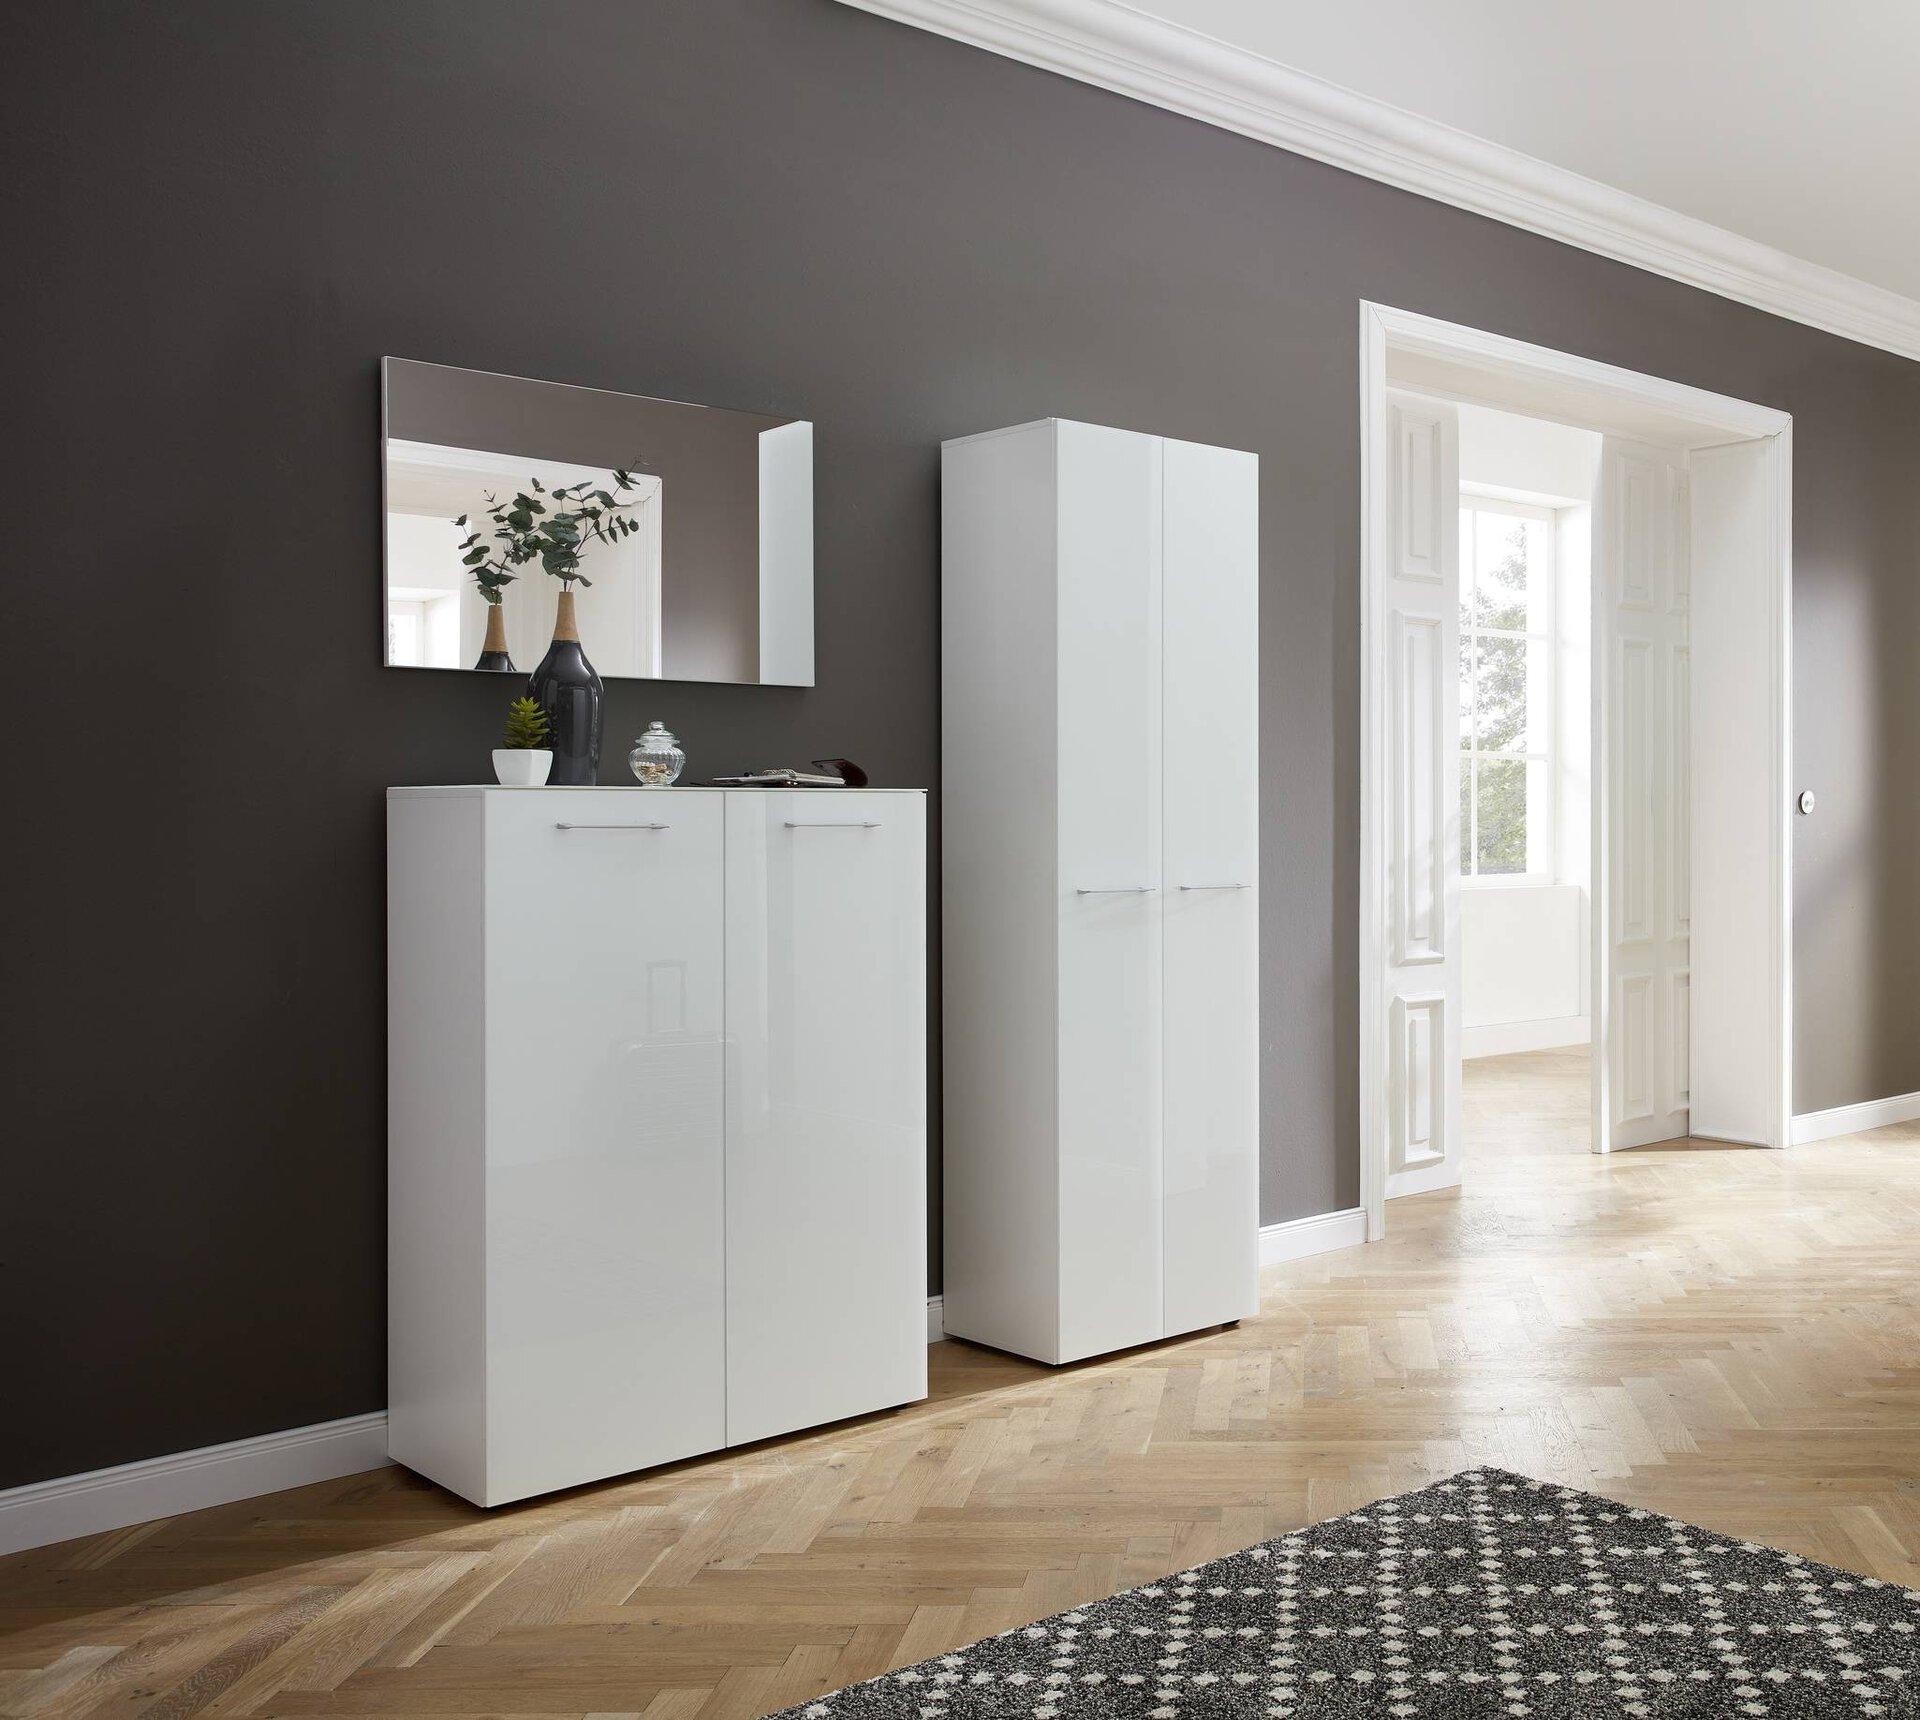 Garderobenbank SCALEA Germania Holzwerkstoff weiß 40 x 47 x 97 cm